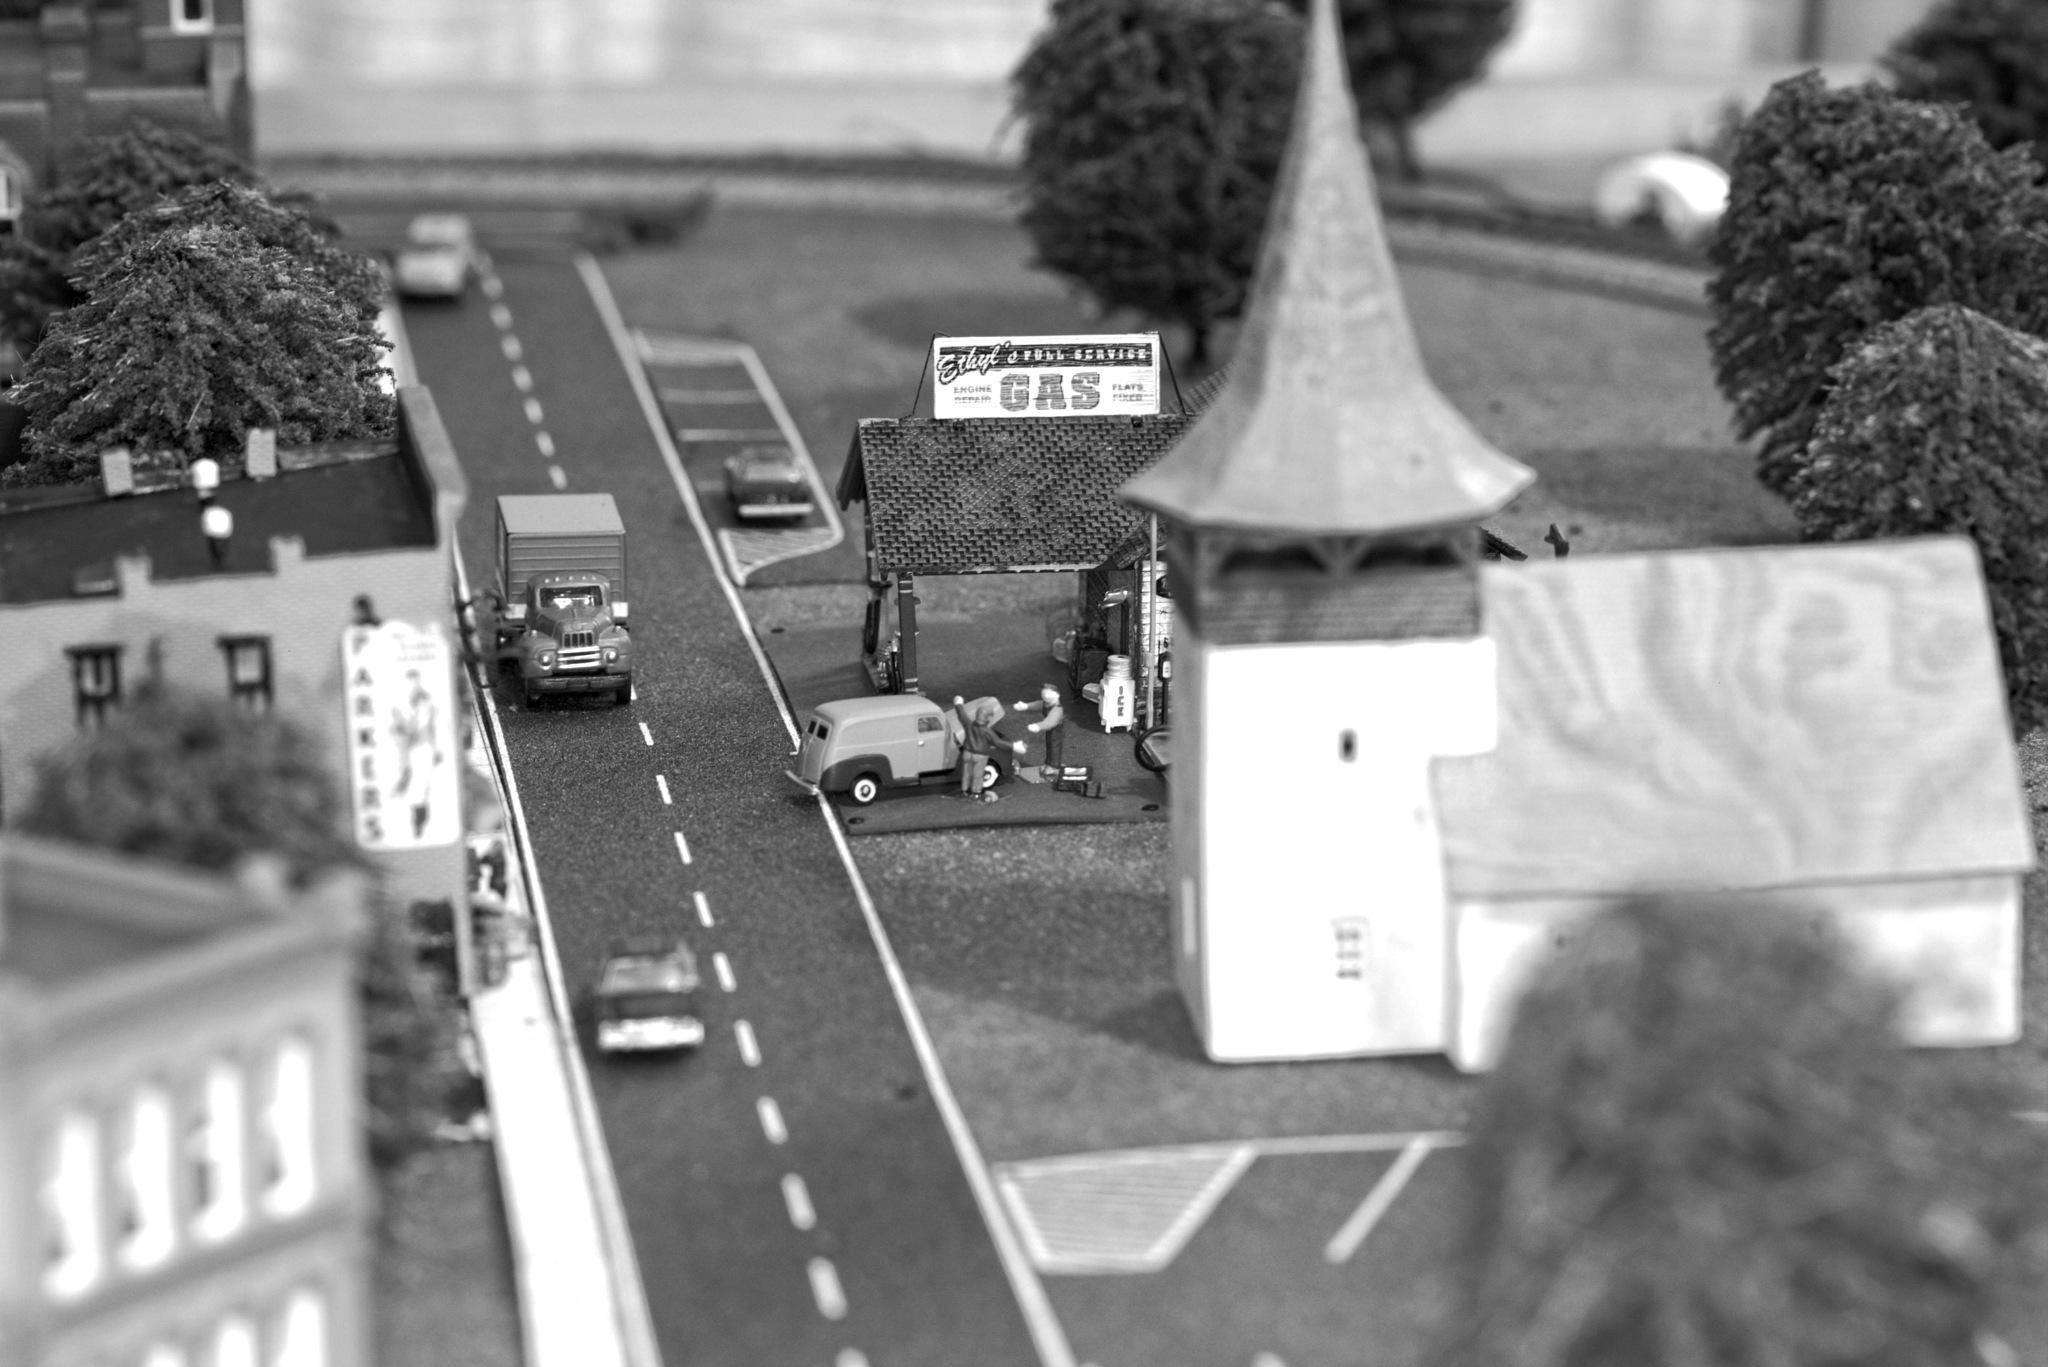 Gas Station by dewoodward